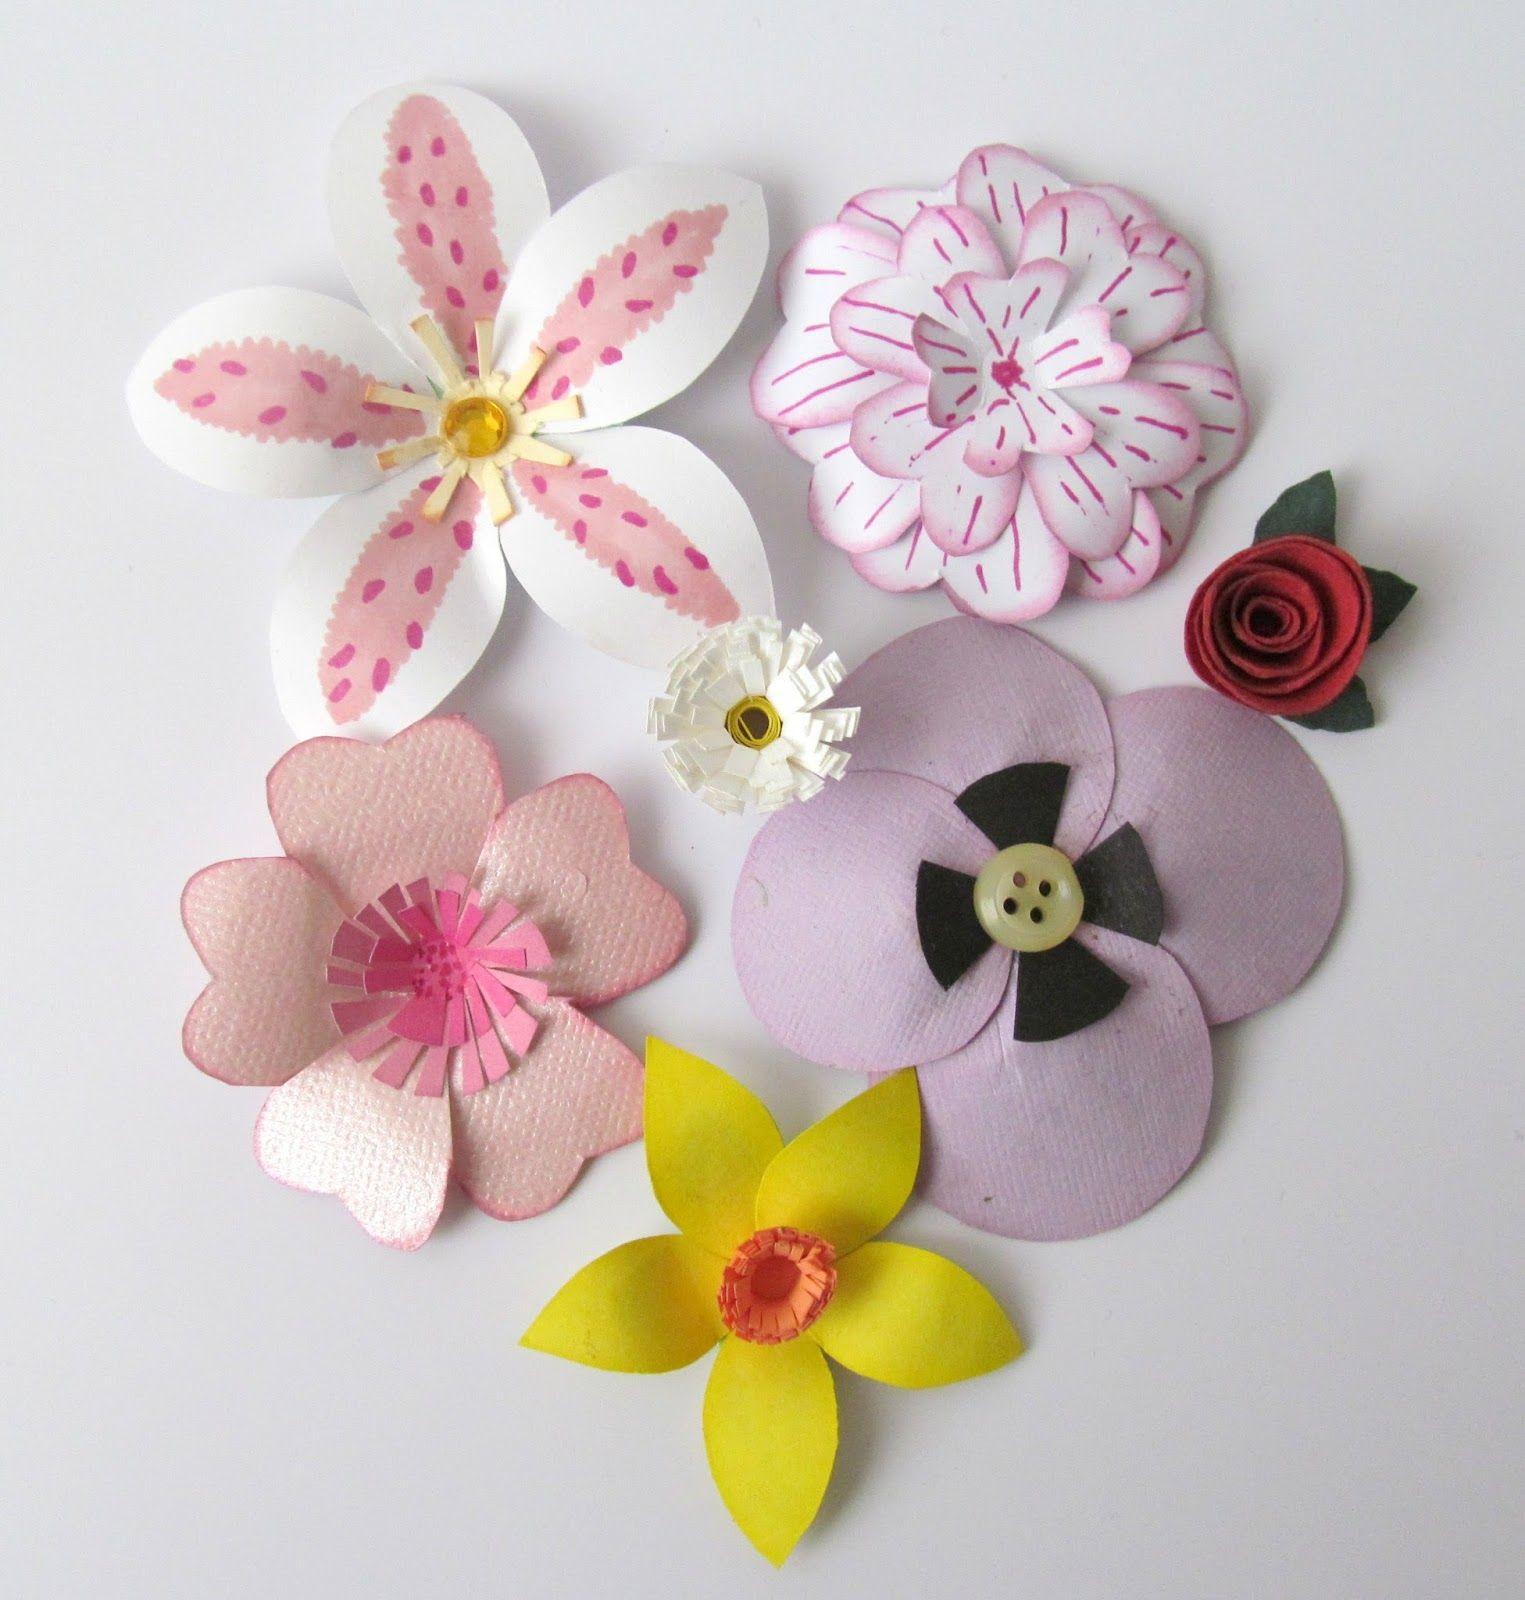 Handmade Paper Flowers Only Weddings Pinterest Handmade Paper